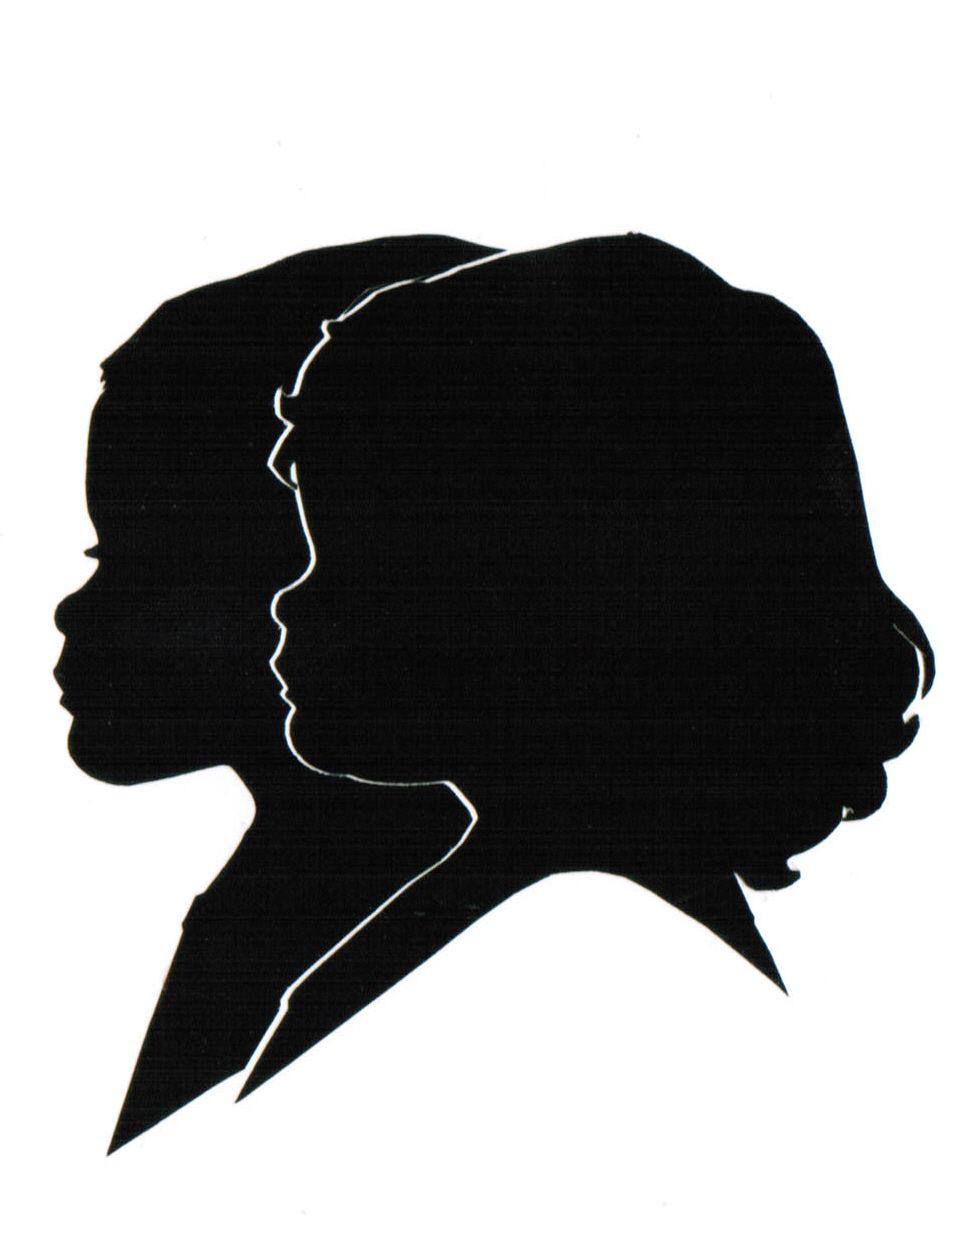 977x1233 Silhouette Silhouette Artist Edward Casey Silhouettes